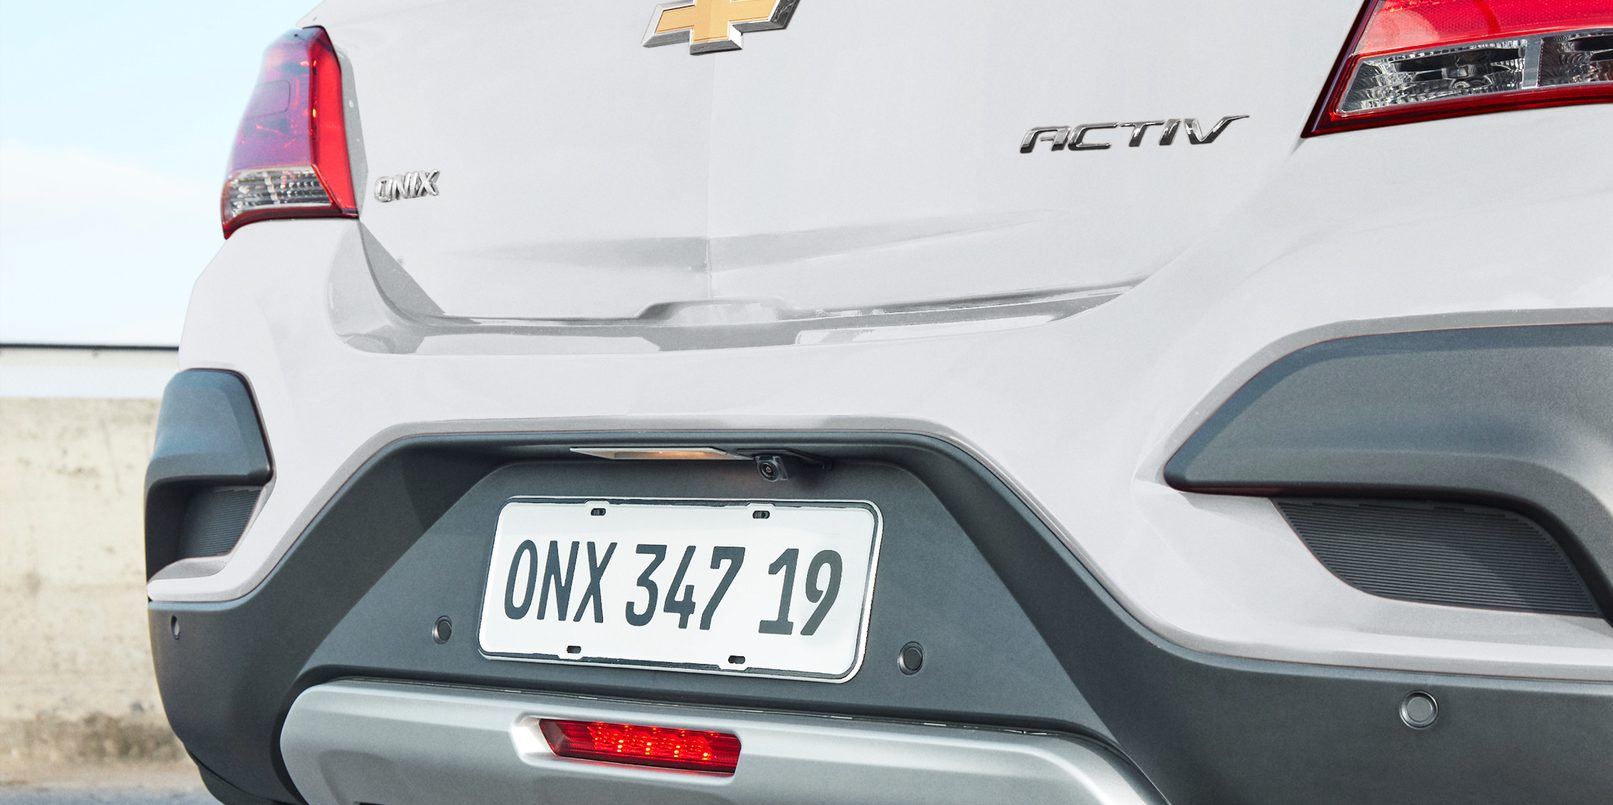 Exterior - Onix Activ